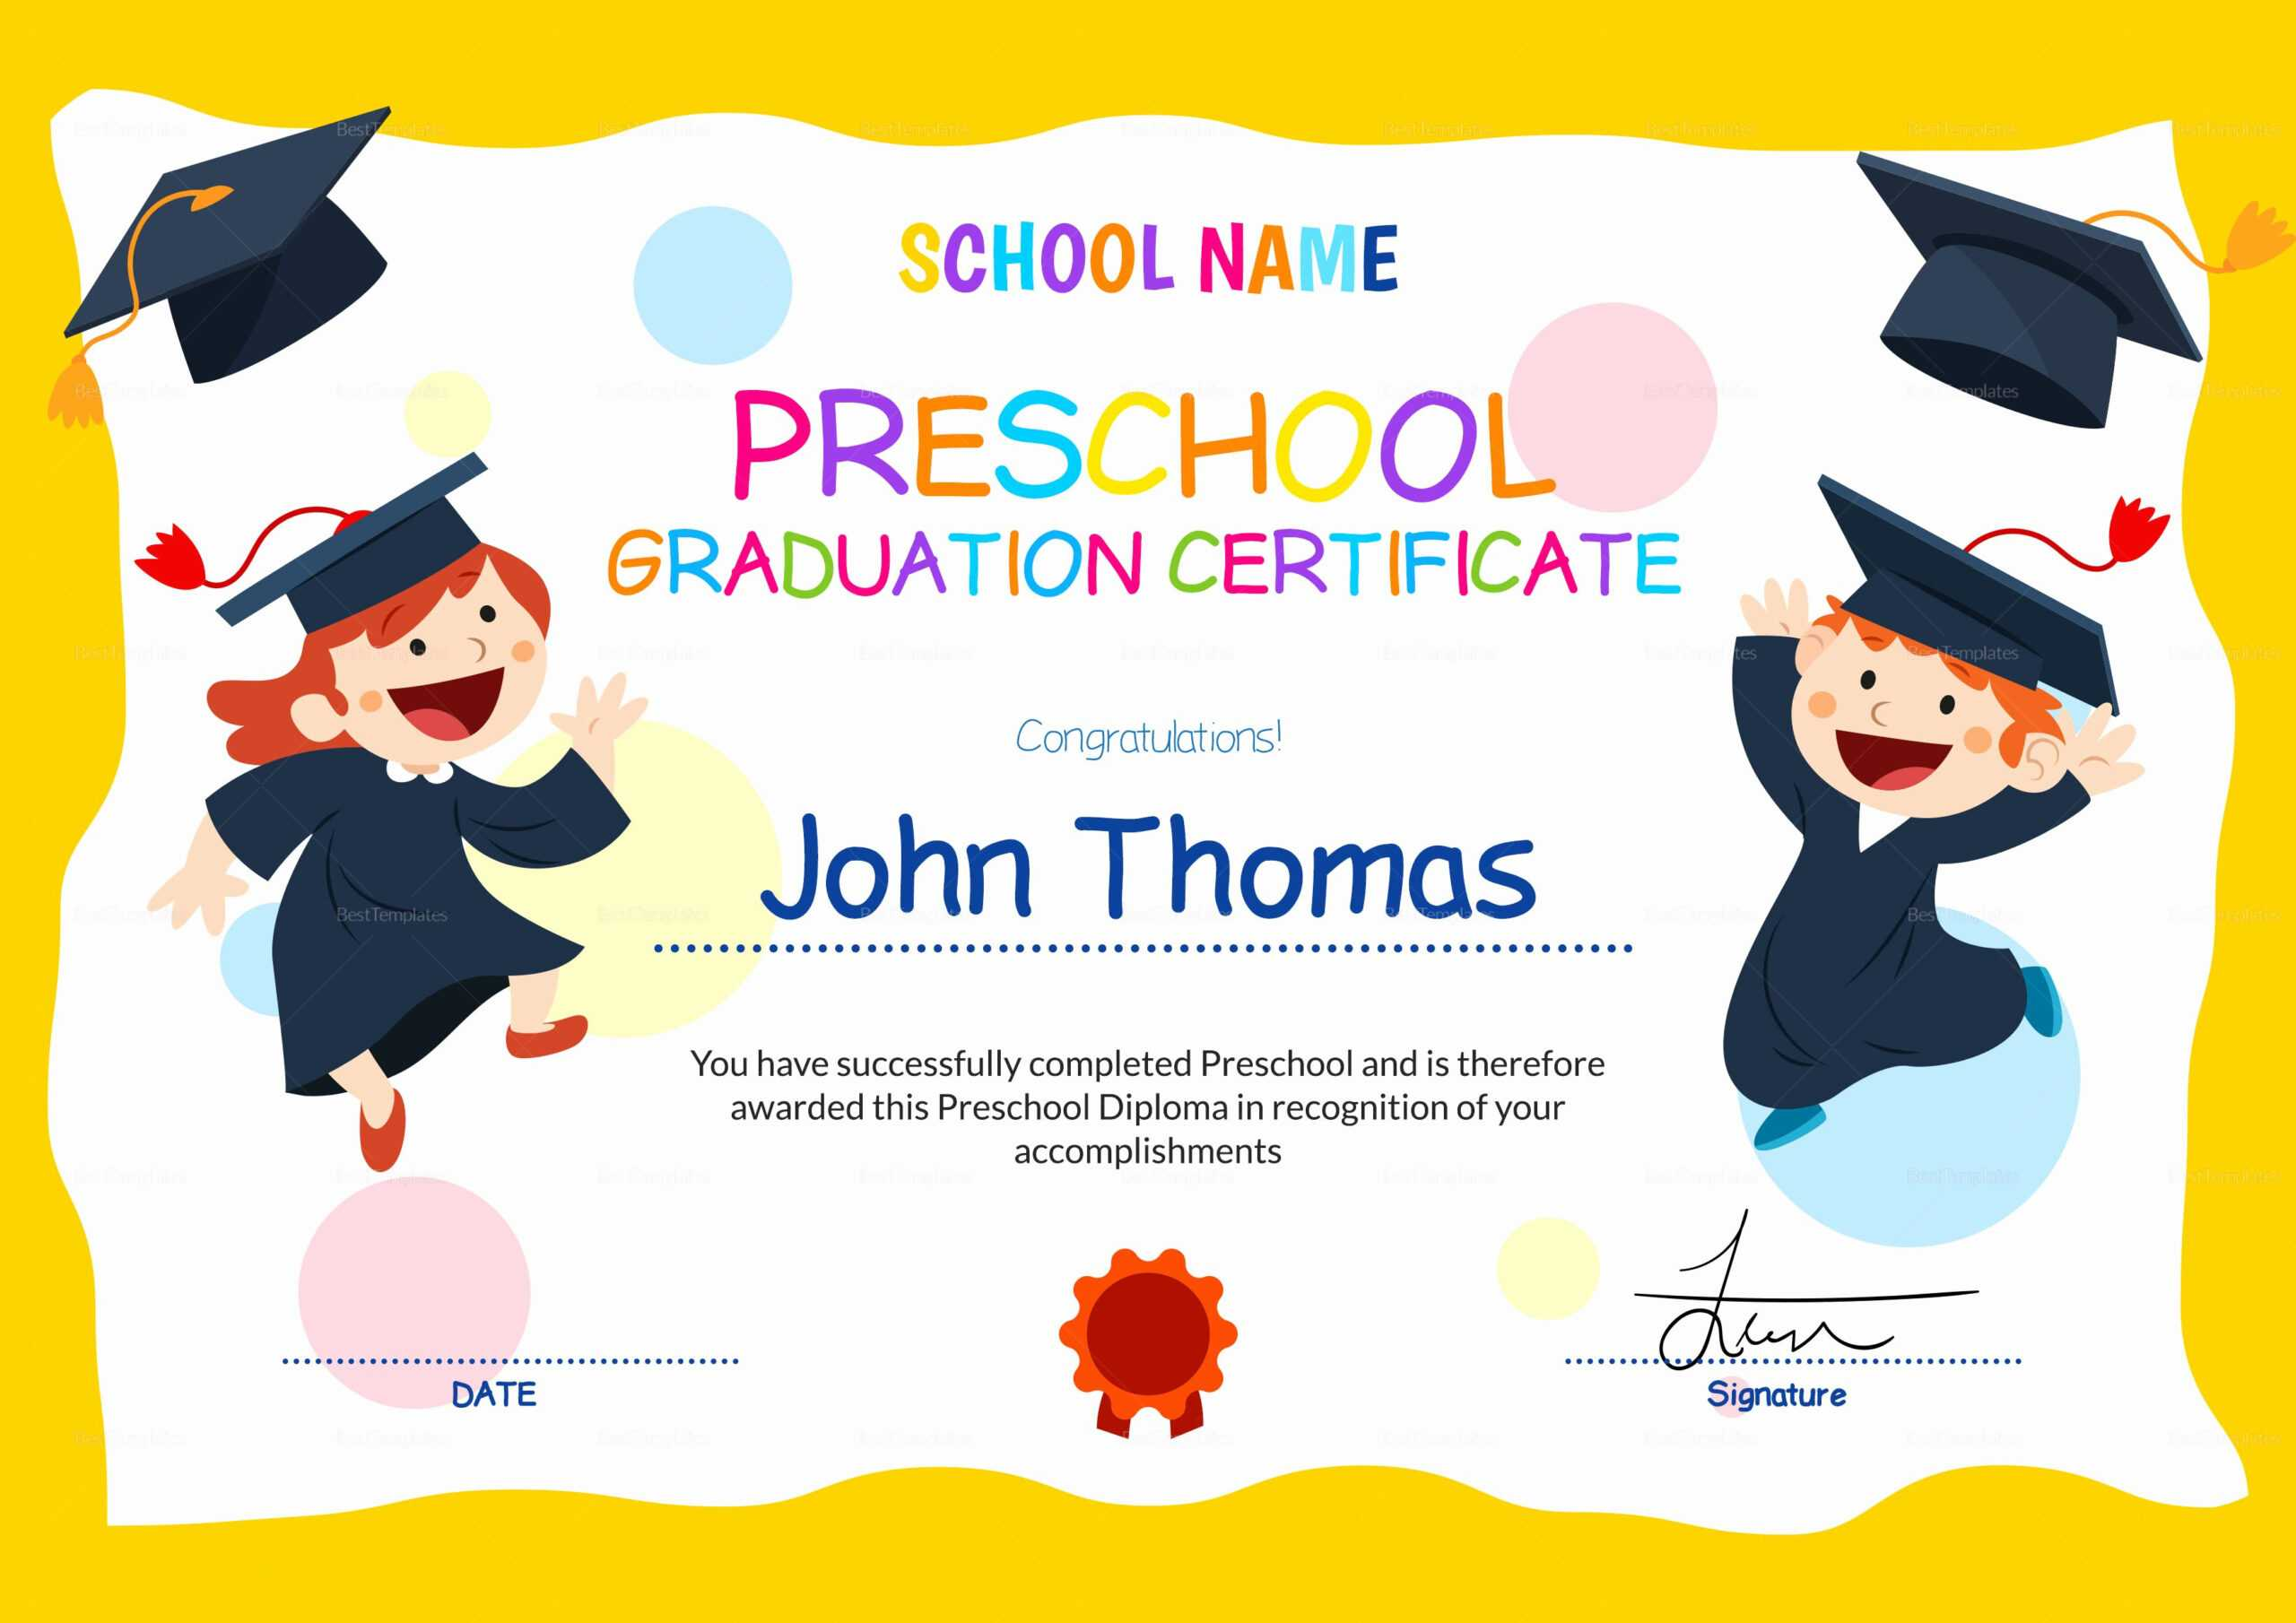 Free Printable Graduation Certificate Templates   Mult-Igry within Free Printable Graduation Certificate Templates